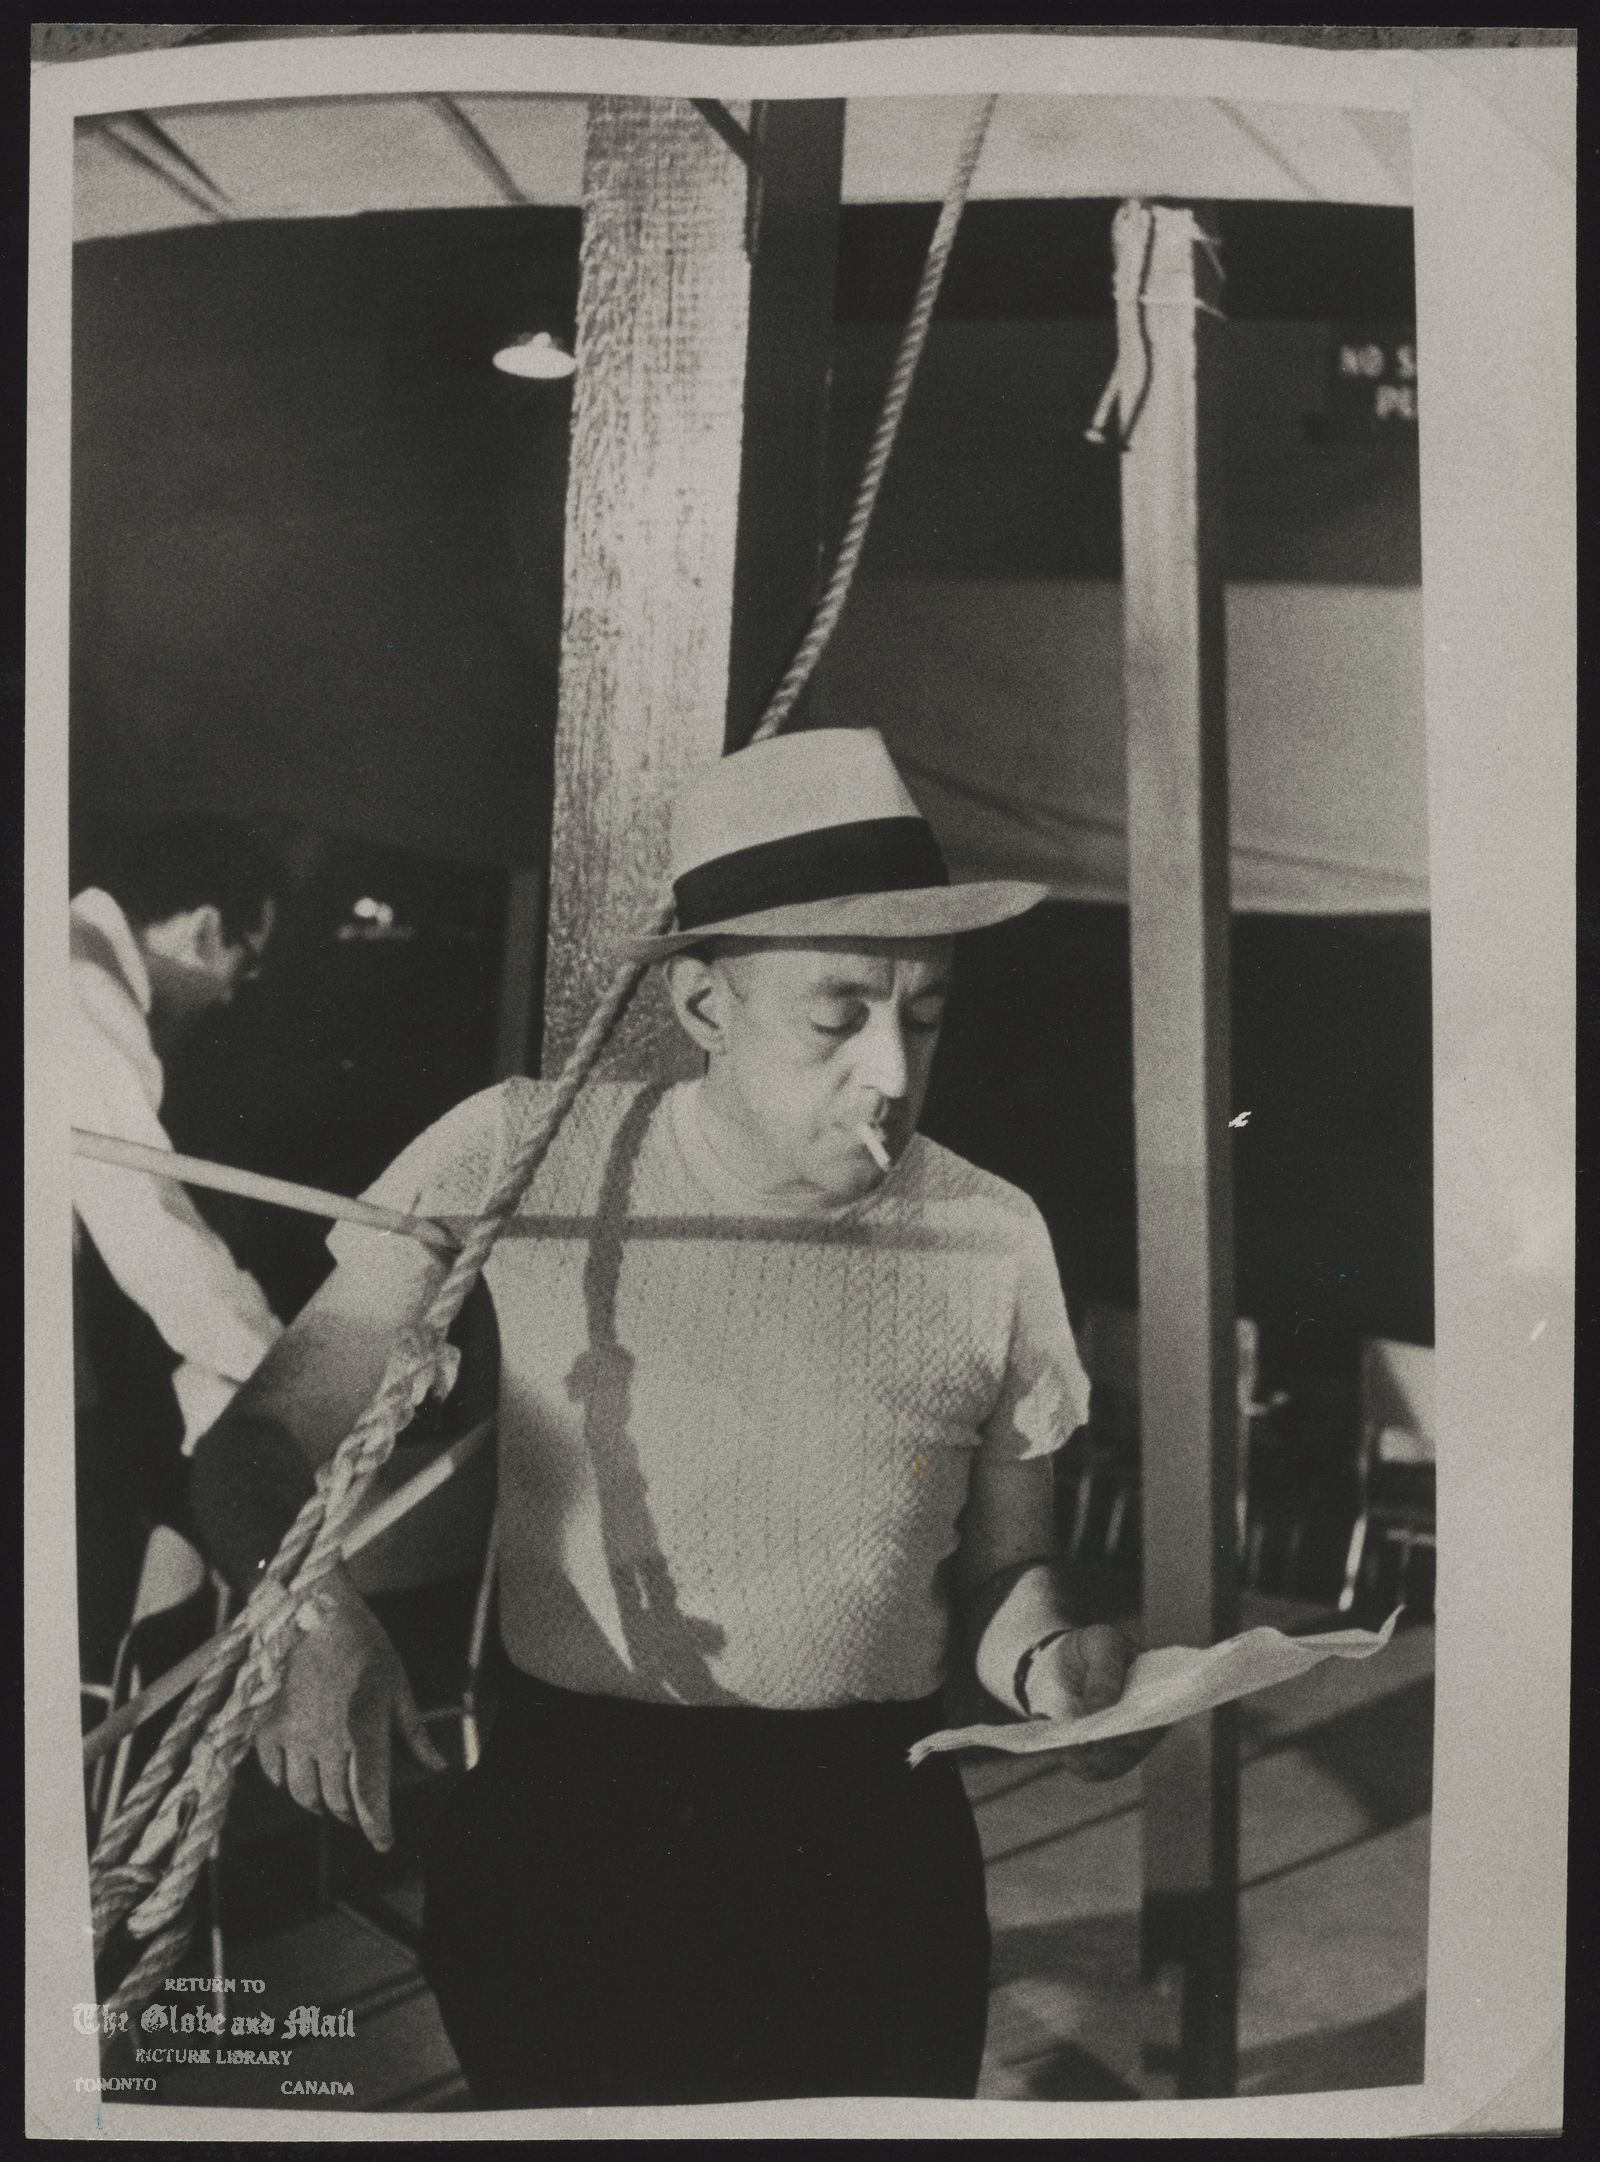 Alec GUINNESS Actor at 1953 Stratford Festival